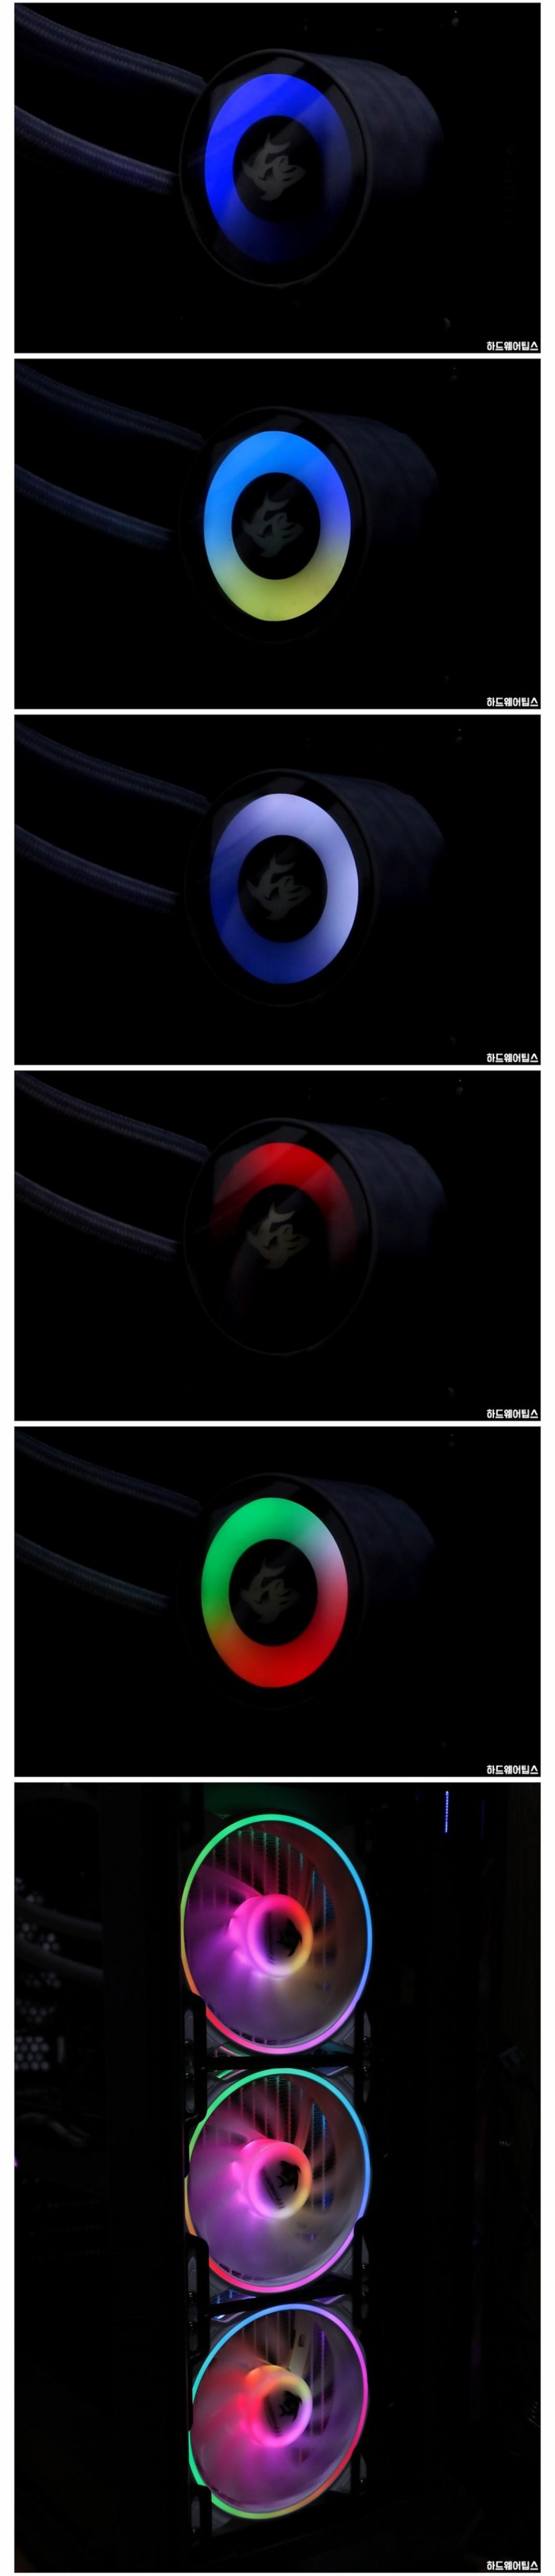 CHENGLIN SHARKHAN APEX360 파힐리언 RGB (WHITE) - 9.jpg